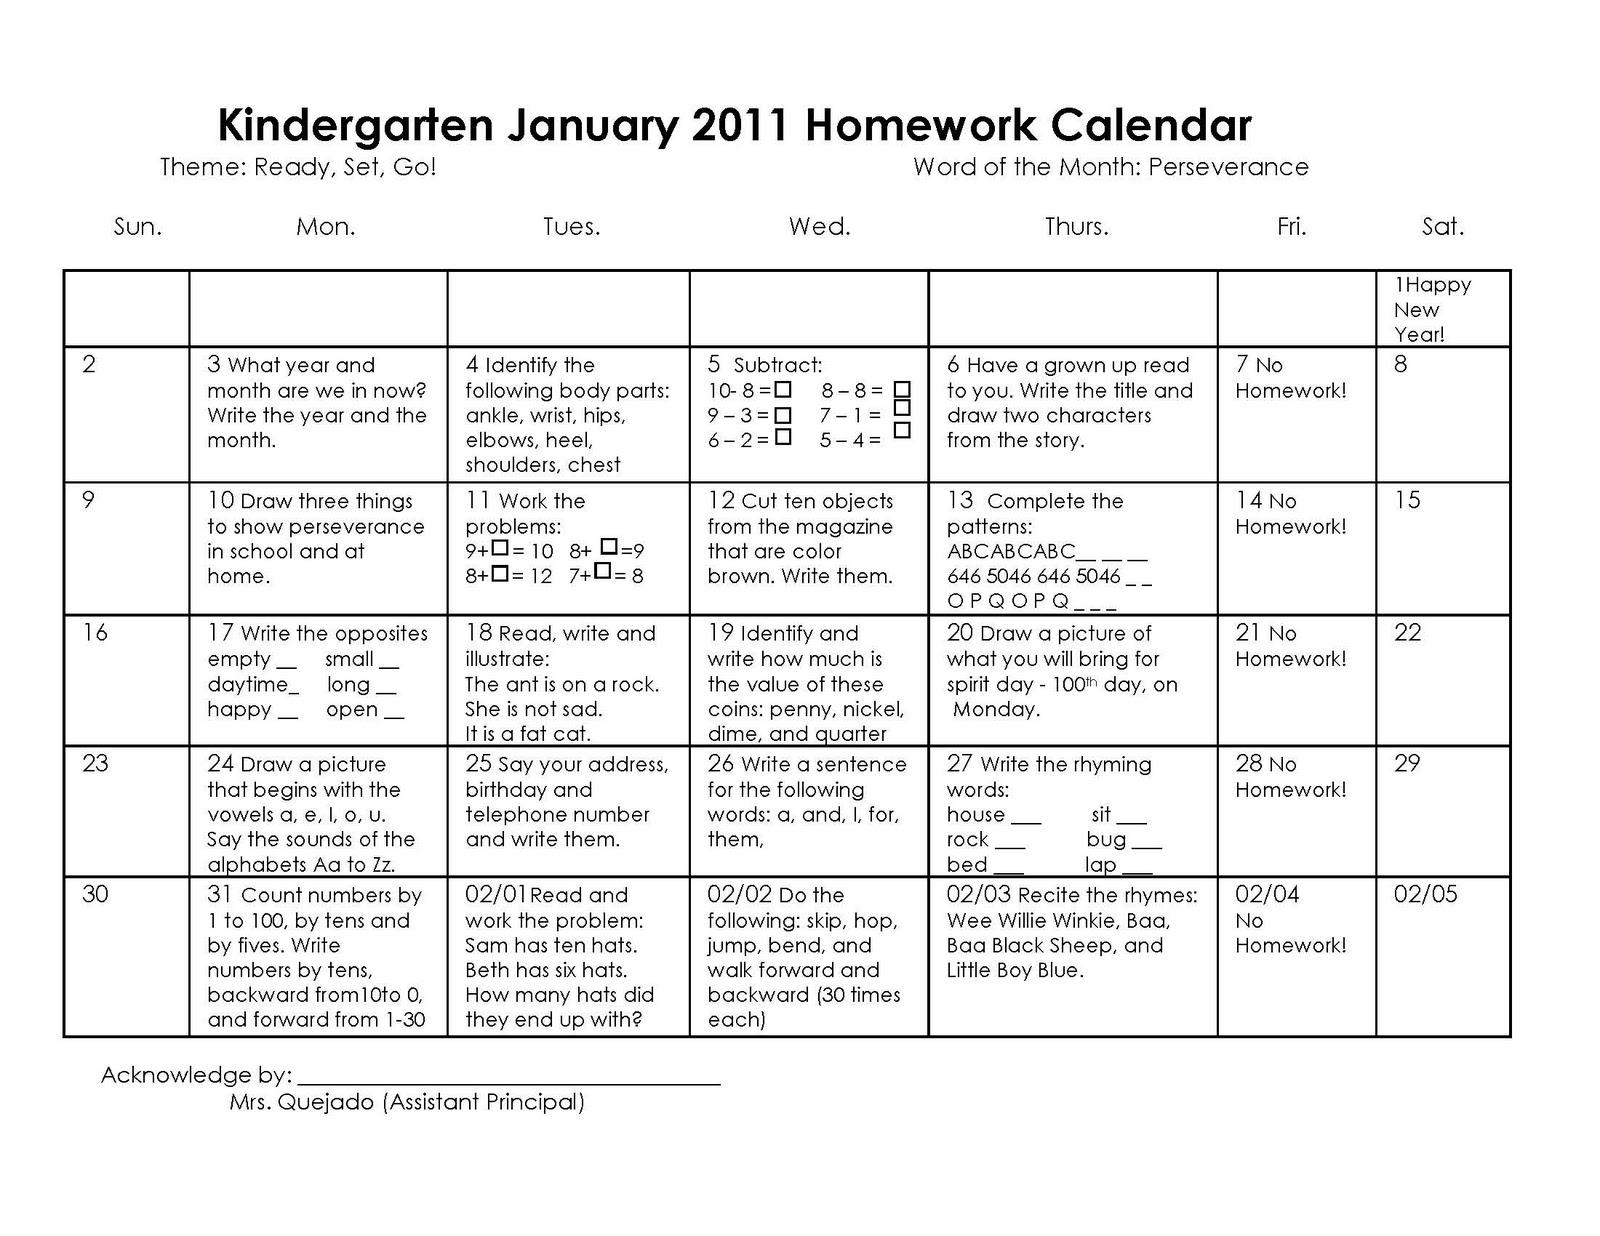 Homework Calendar Kindergarten : Lyndon baines johnson elementary school kindergarten